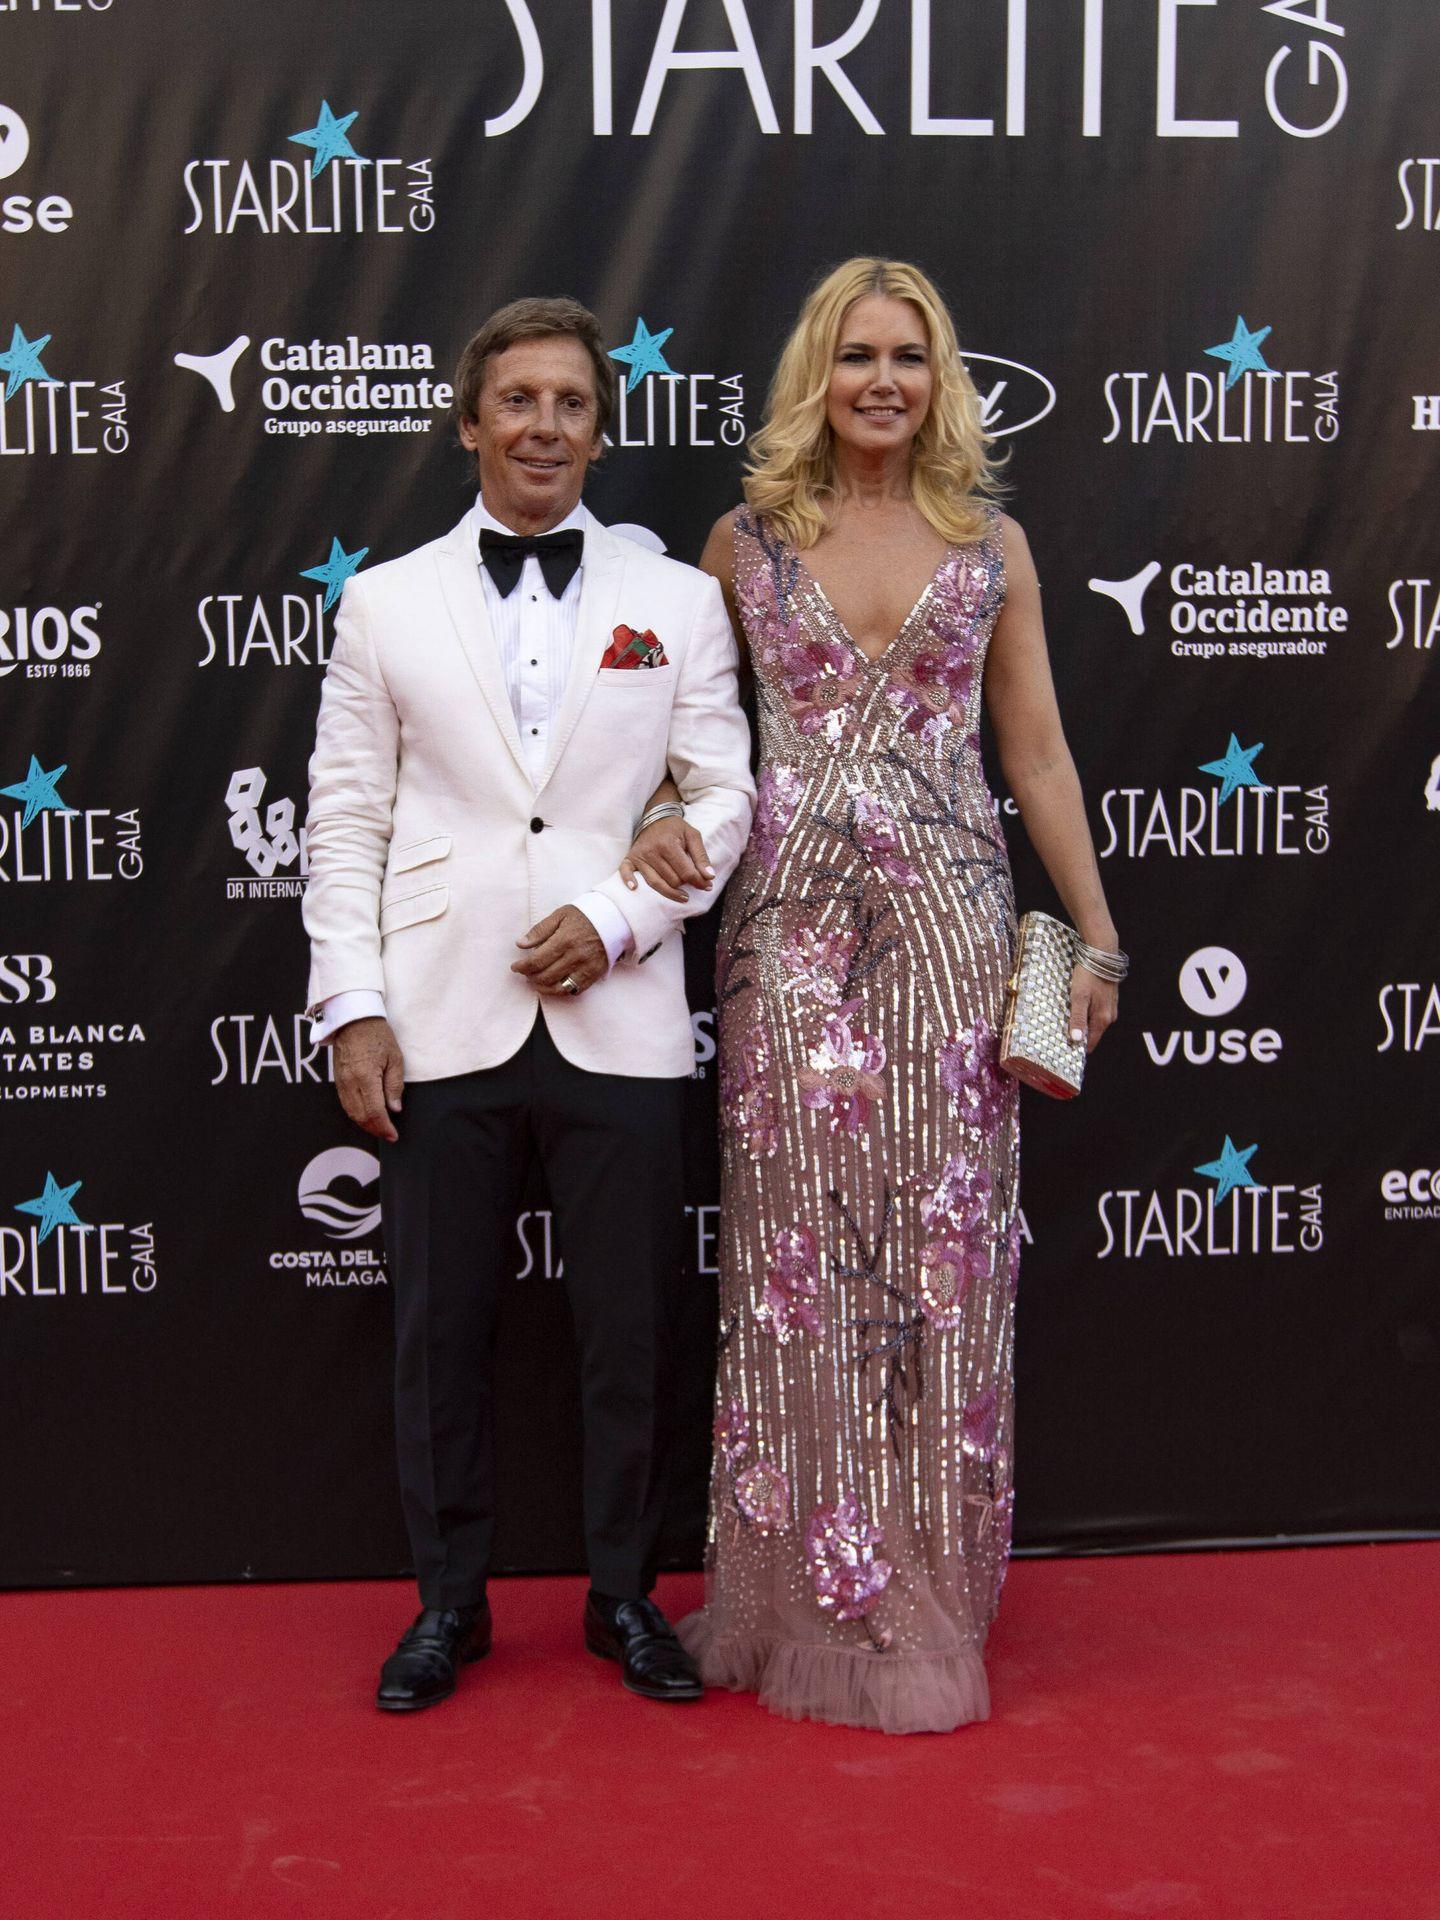 Valeria Mazza y Alejandro Gravier. (Imagen: Cordon Press)